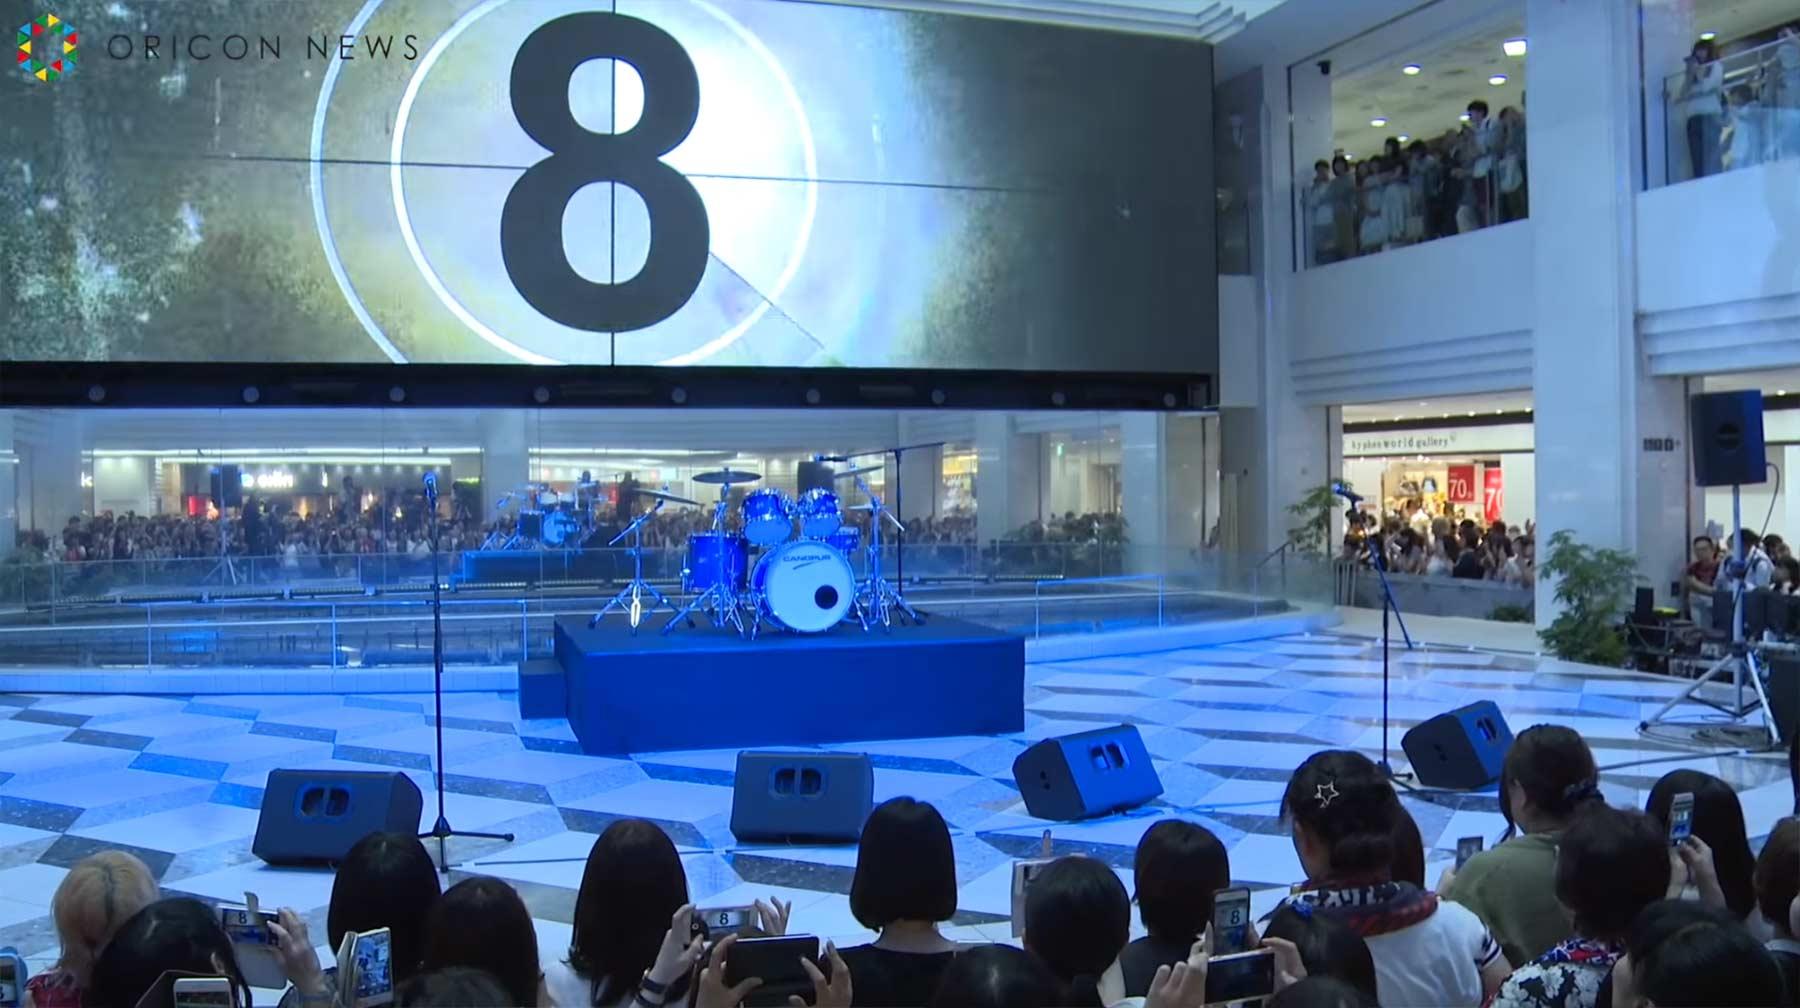 Dieses Konzert dauerte nur acht Sekunden 8-sekunden-konzert